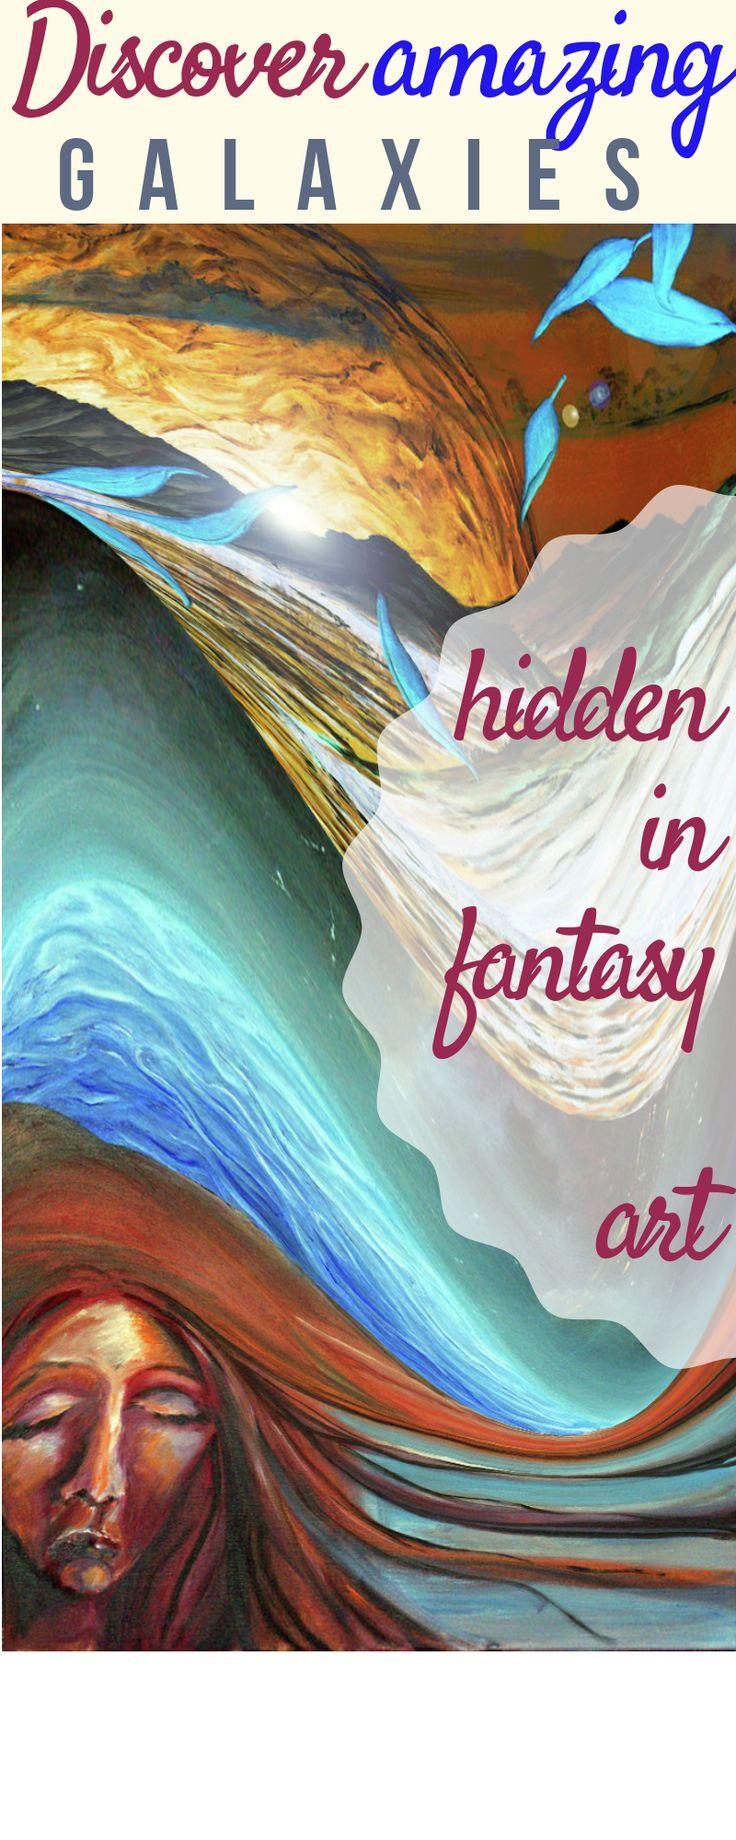 Artworks featuring galaxies nebulas stars and deep space fantasies